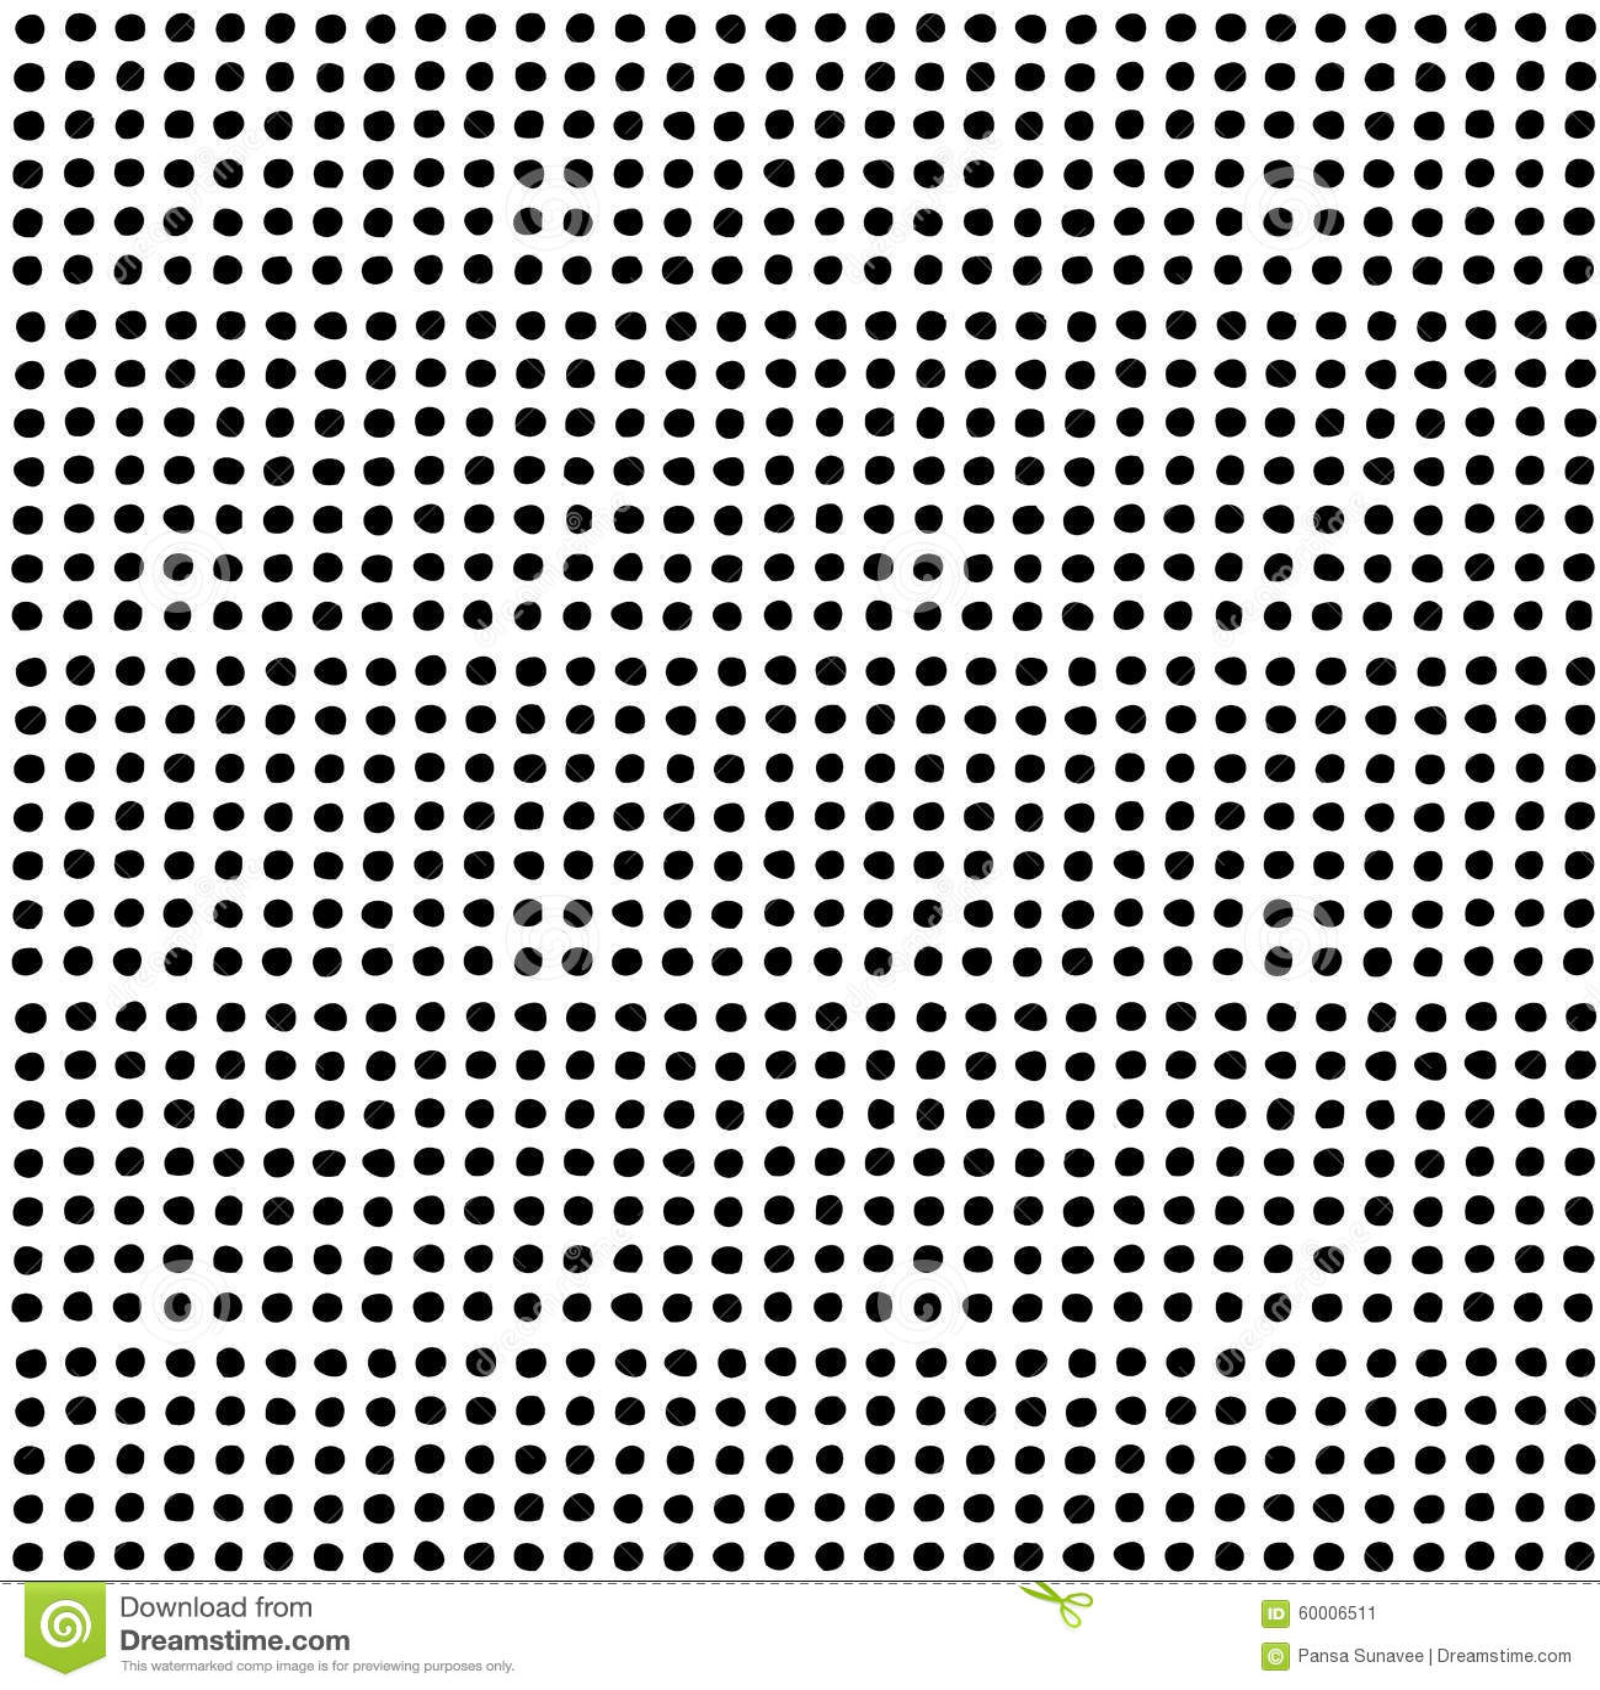 Hand Drawn Dot Pattern Stock Vector Illustration Of